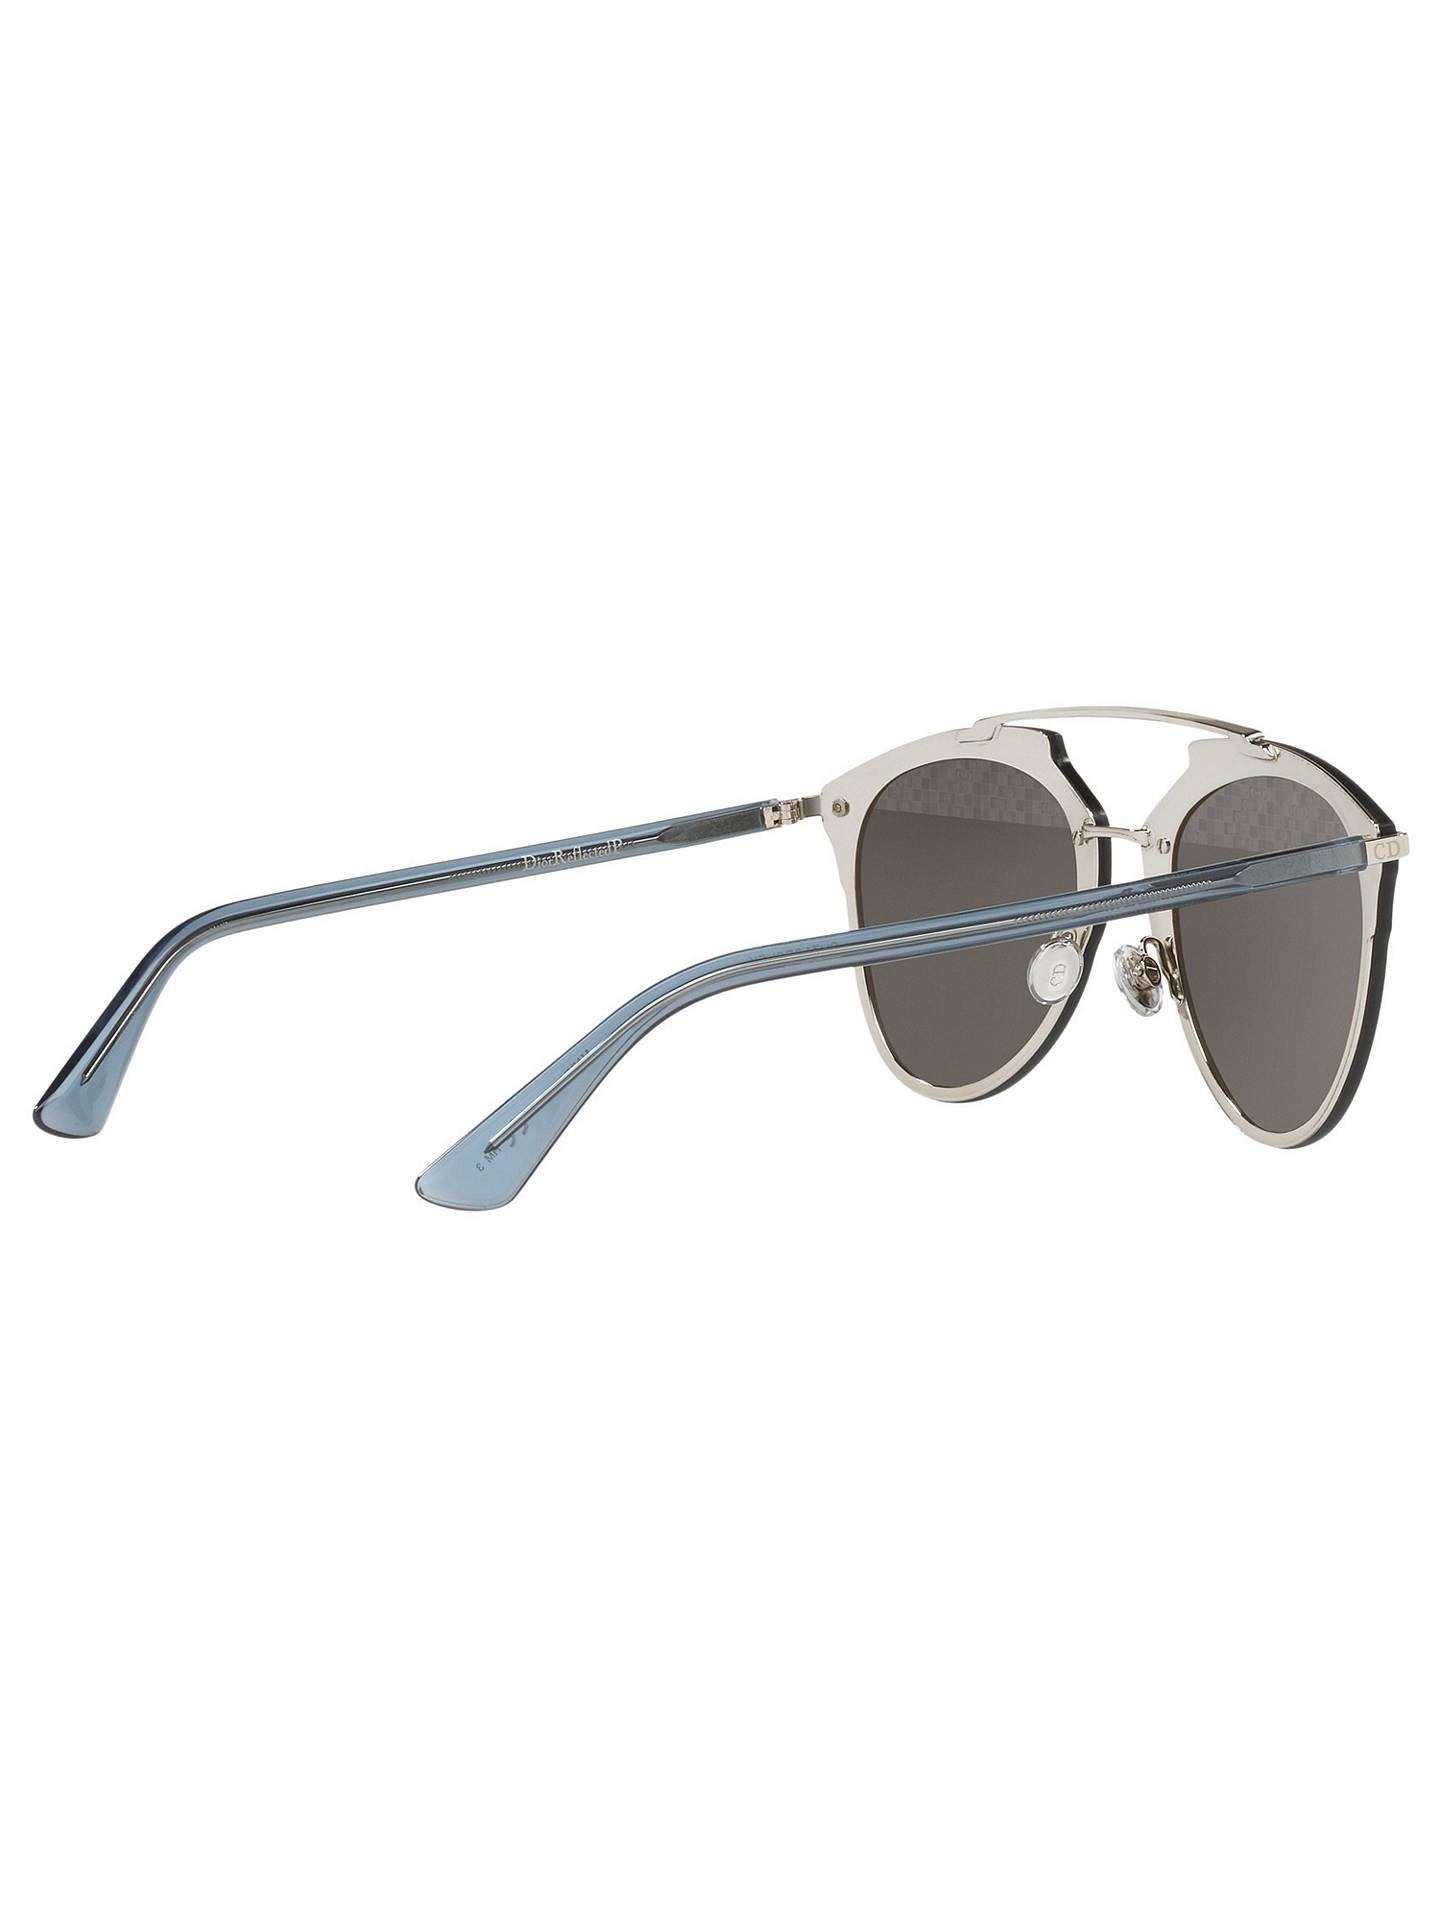 6ebfcdb101c Dior DiorReflectedP Geometric Sunglasses at John Lewis   Partners